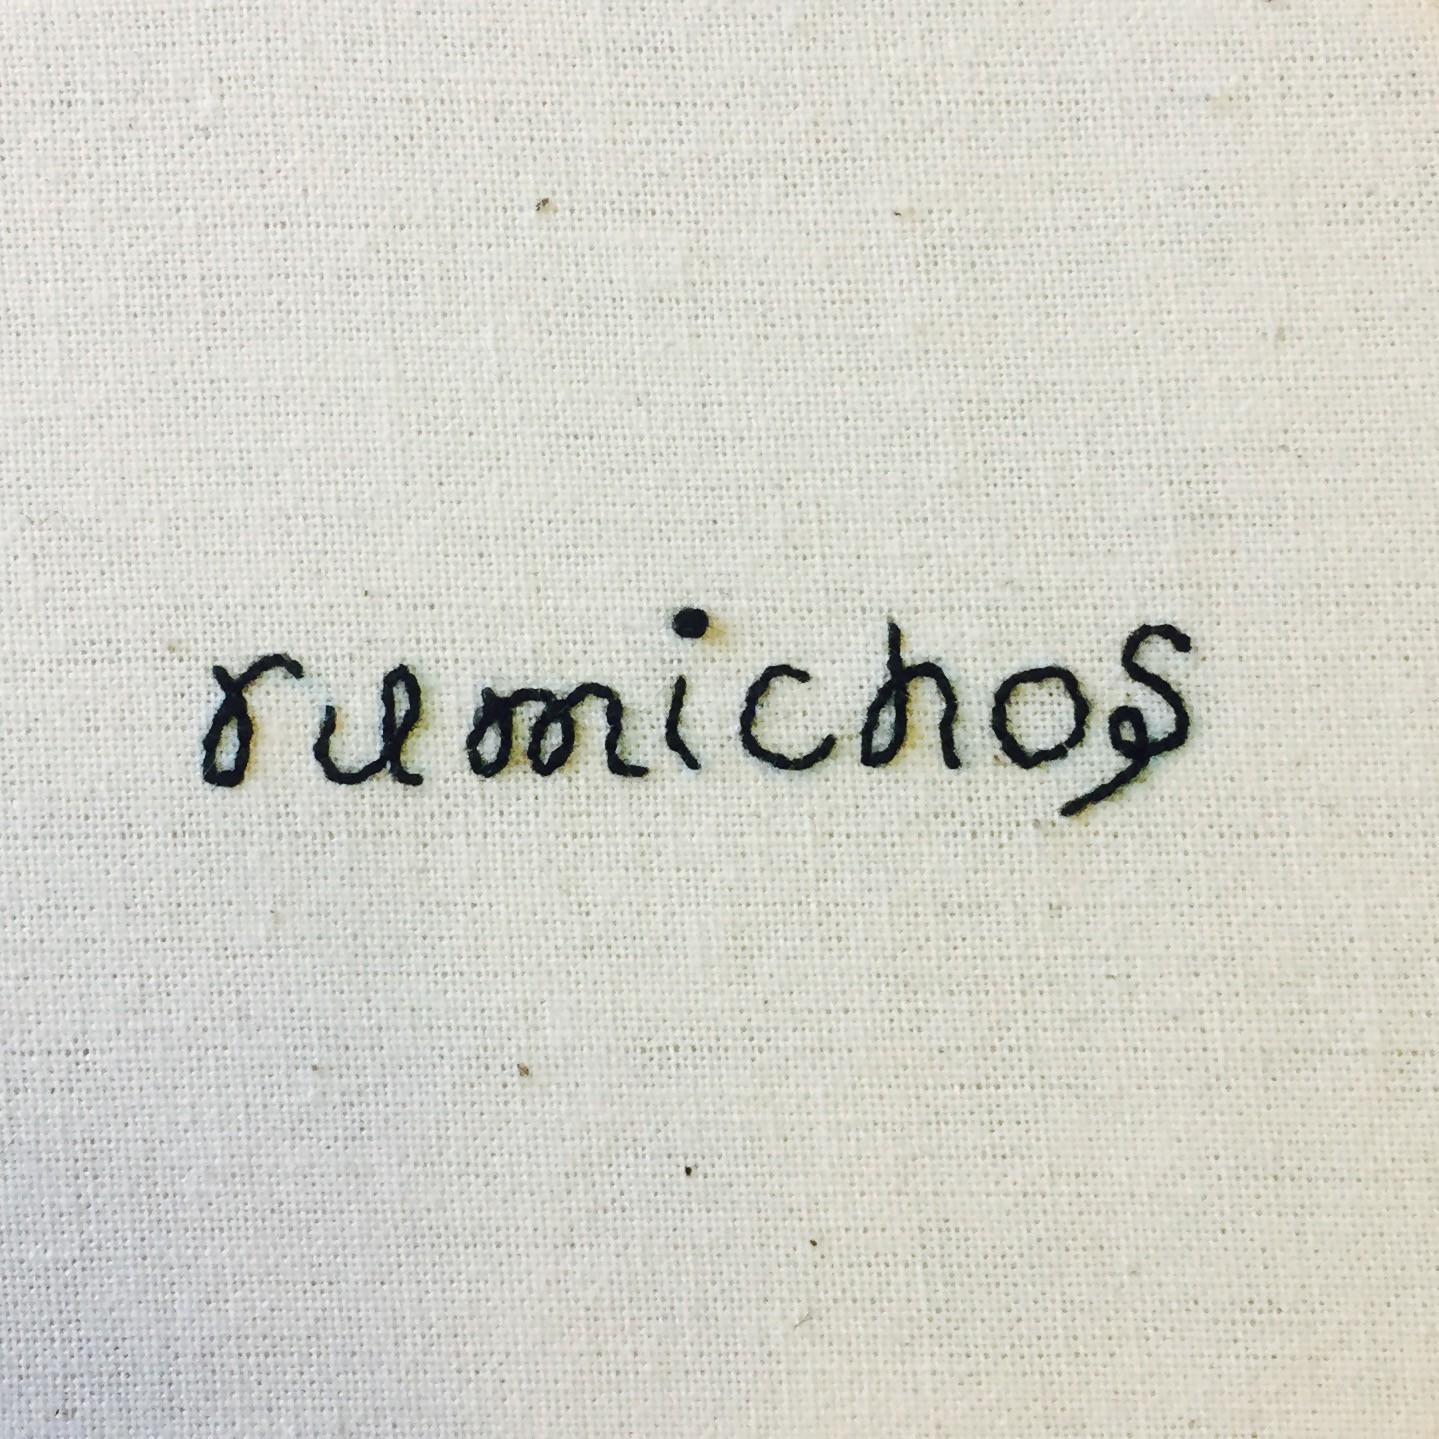 rumichos